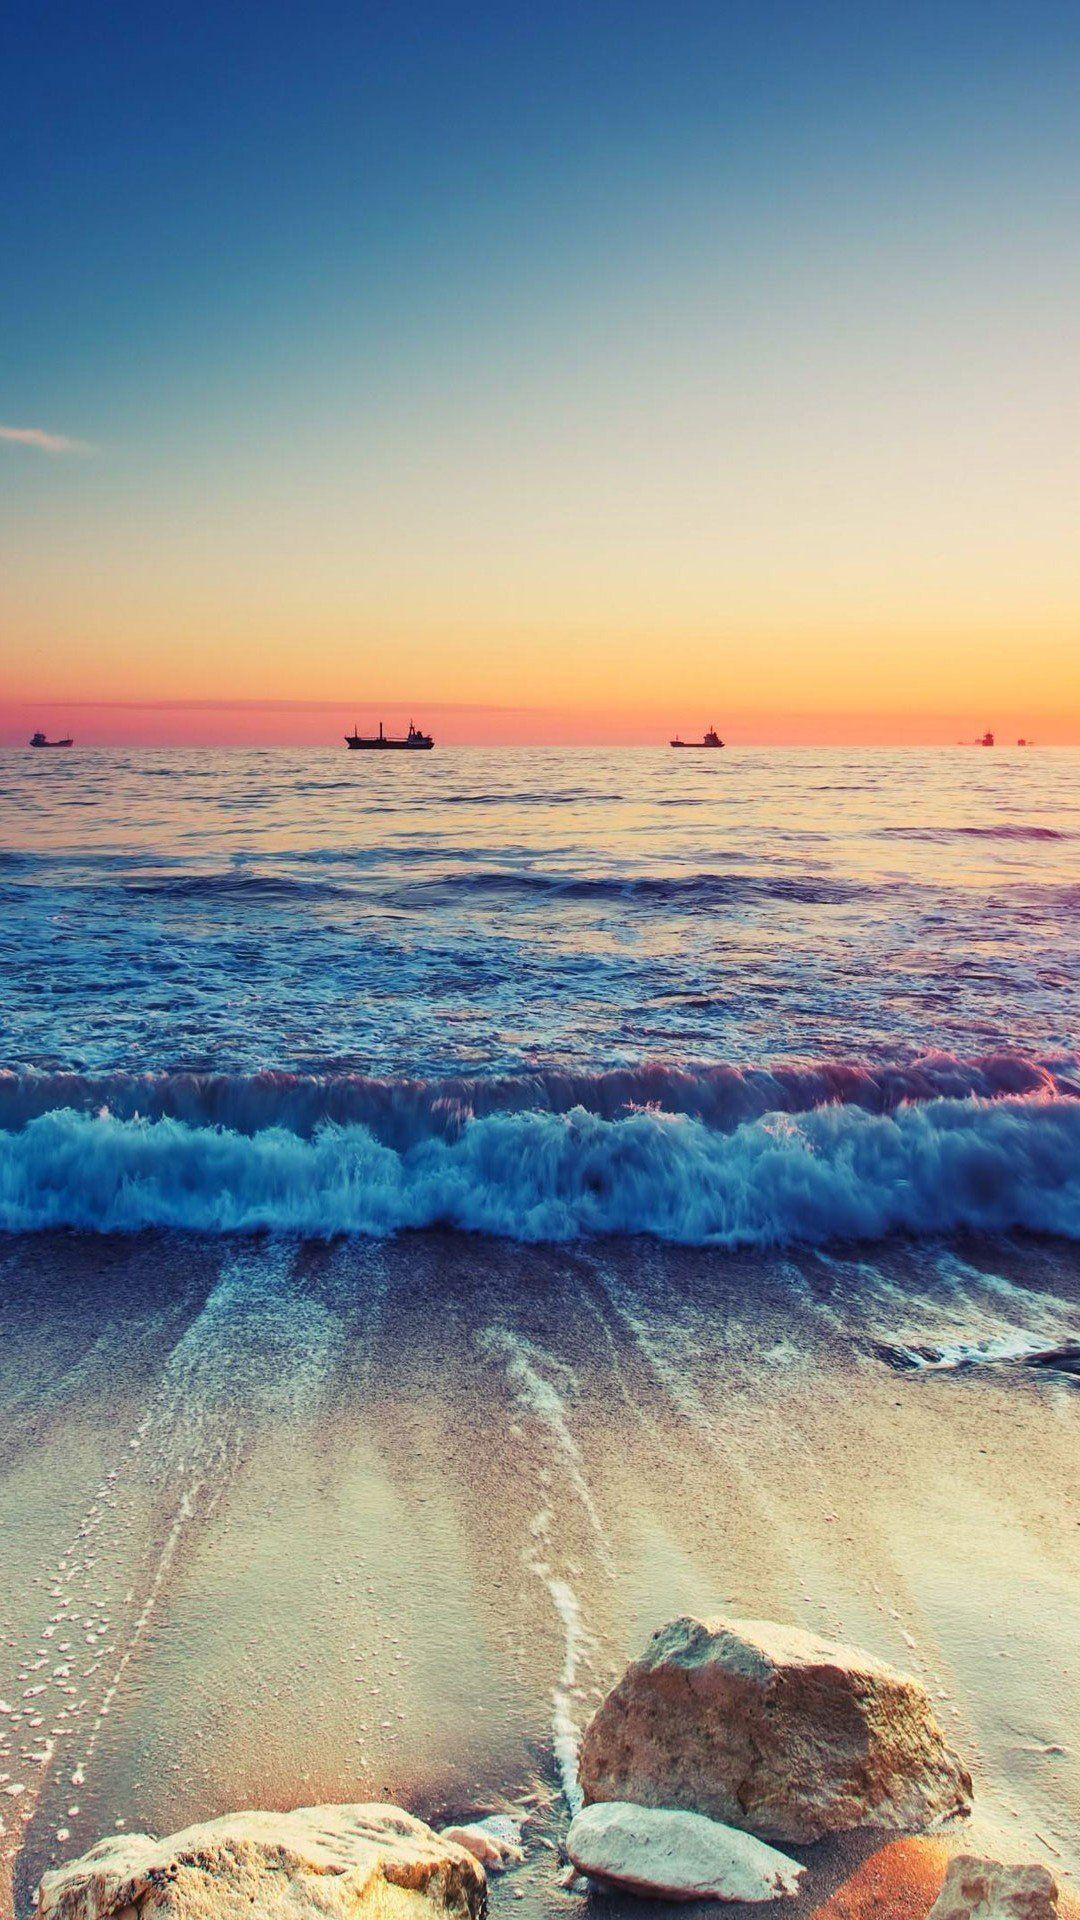 Phone Wallpaper Landscape Beach Ocean Sea Scenery